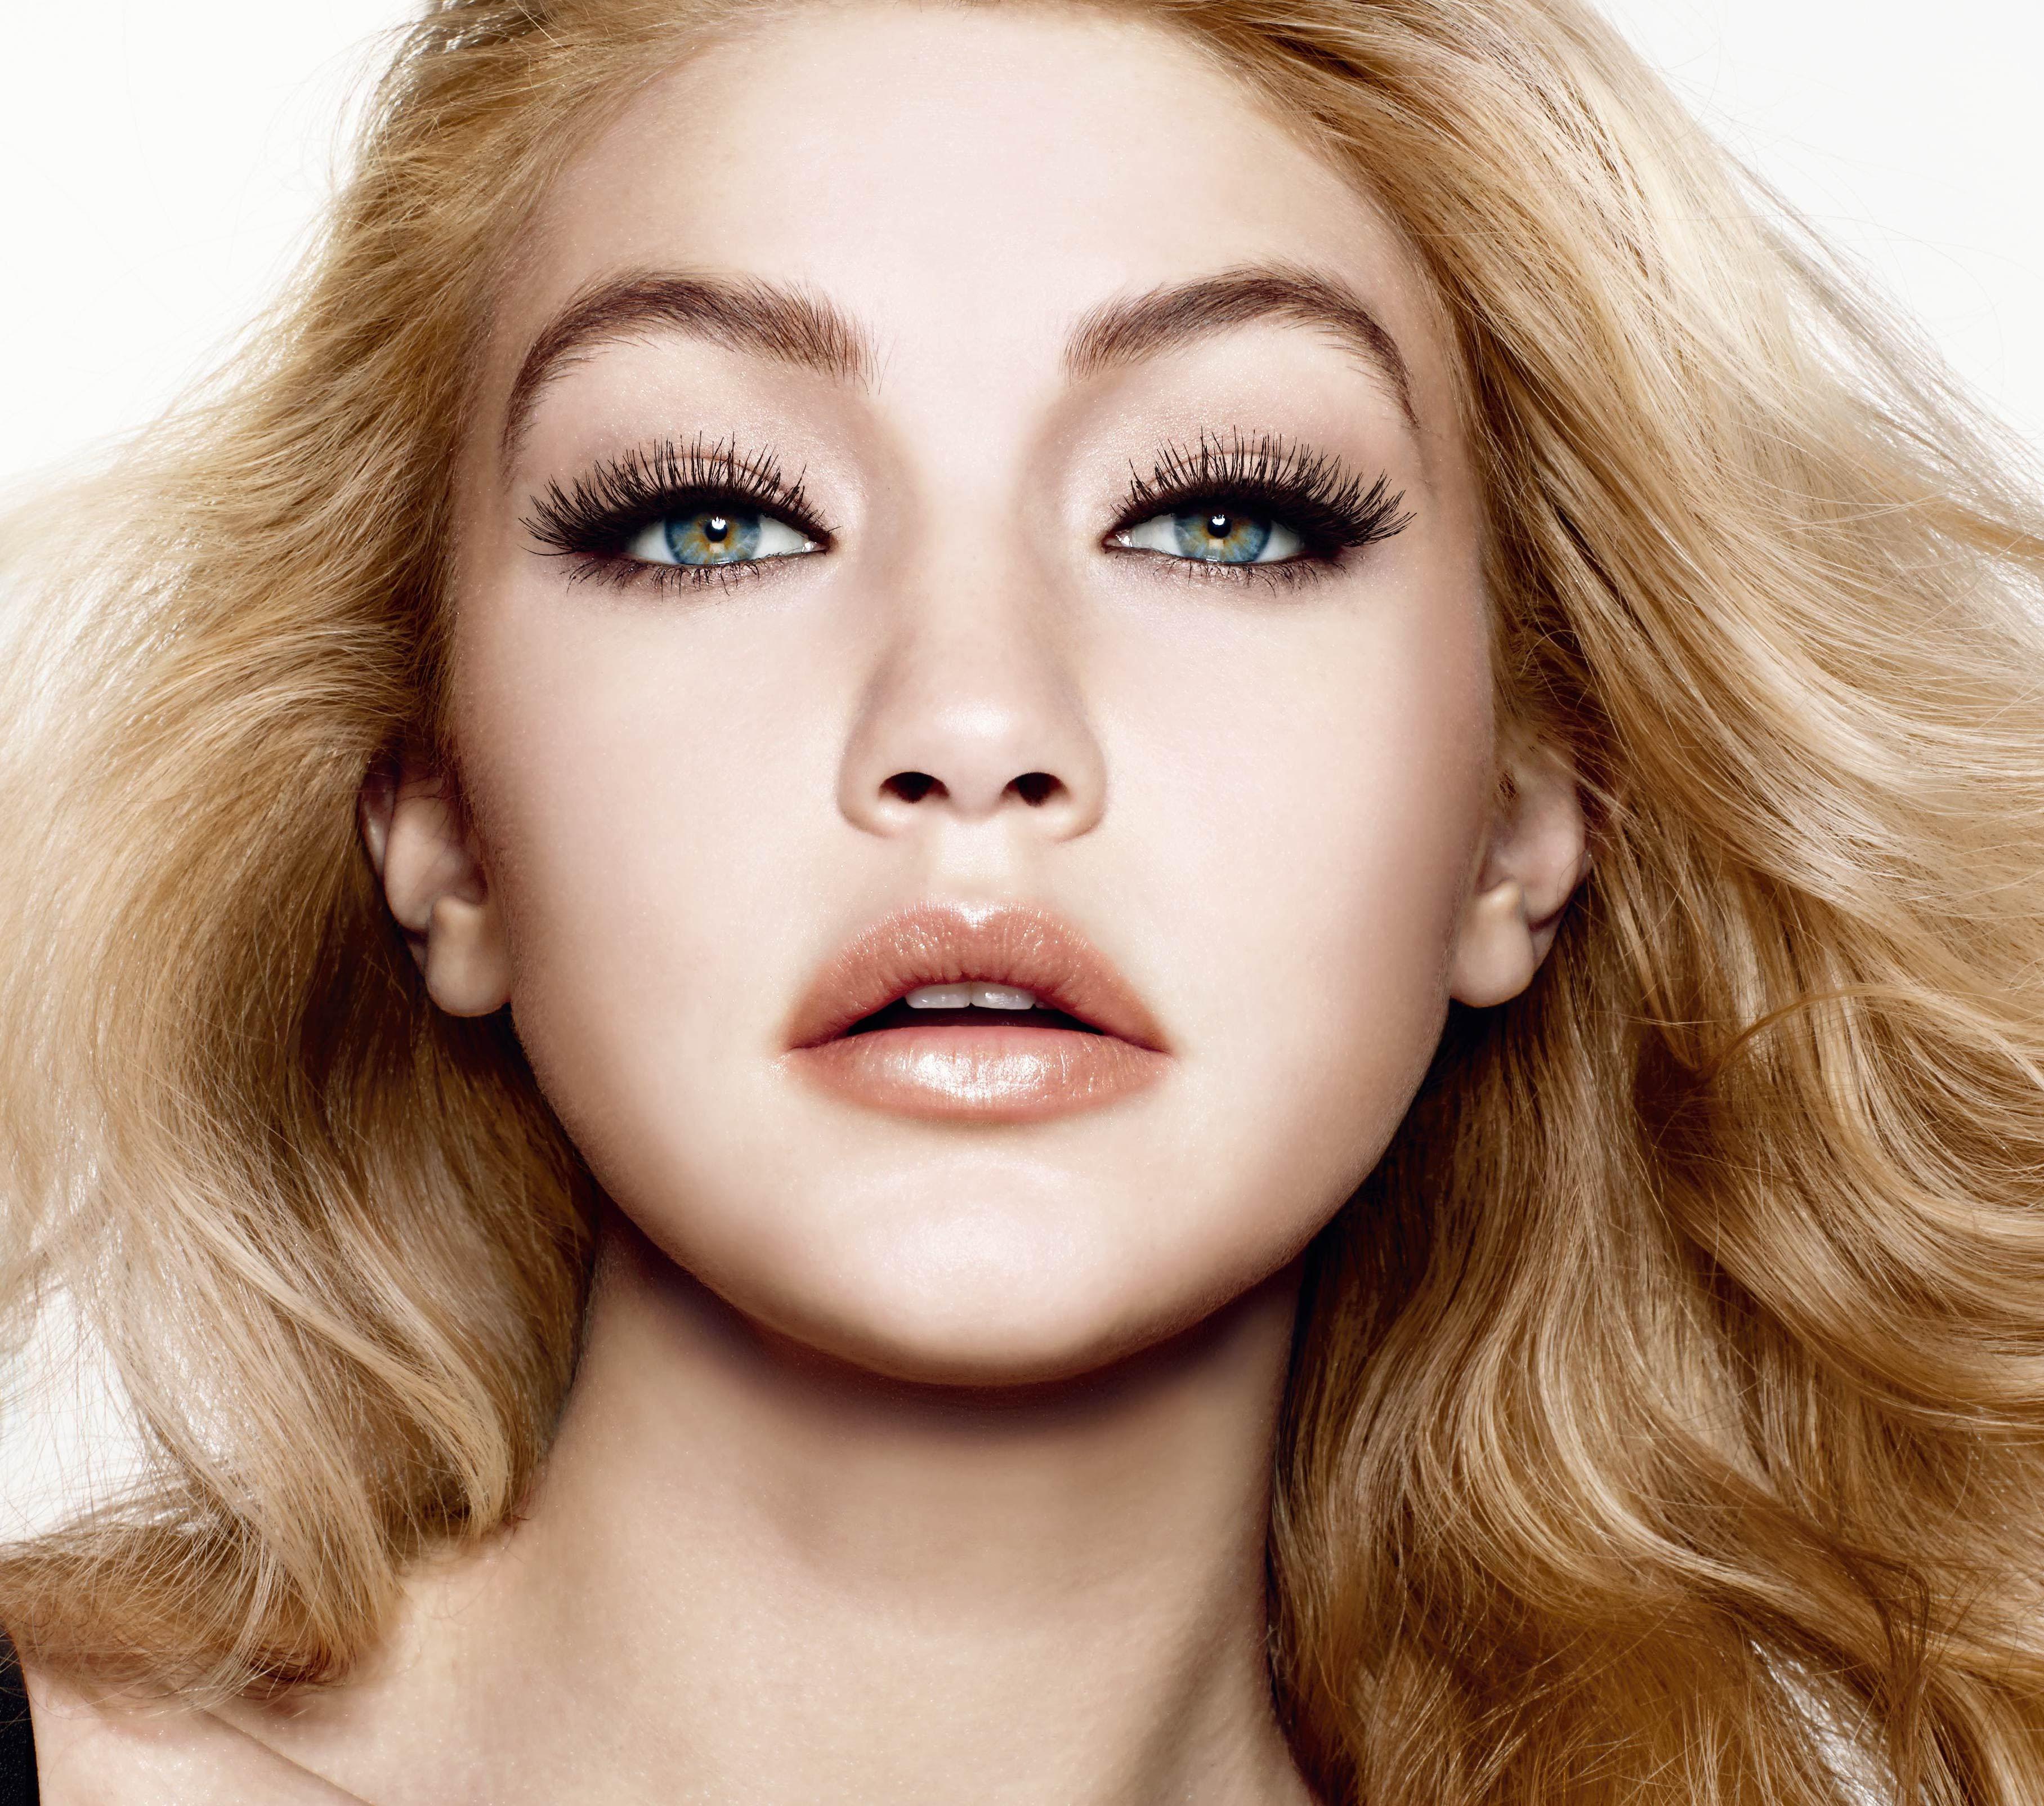 Gigi Hadid Eyes, HD Celebrities, 4k Wallpapers, Images